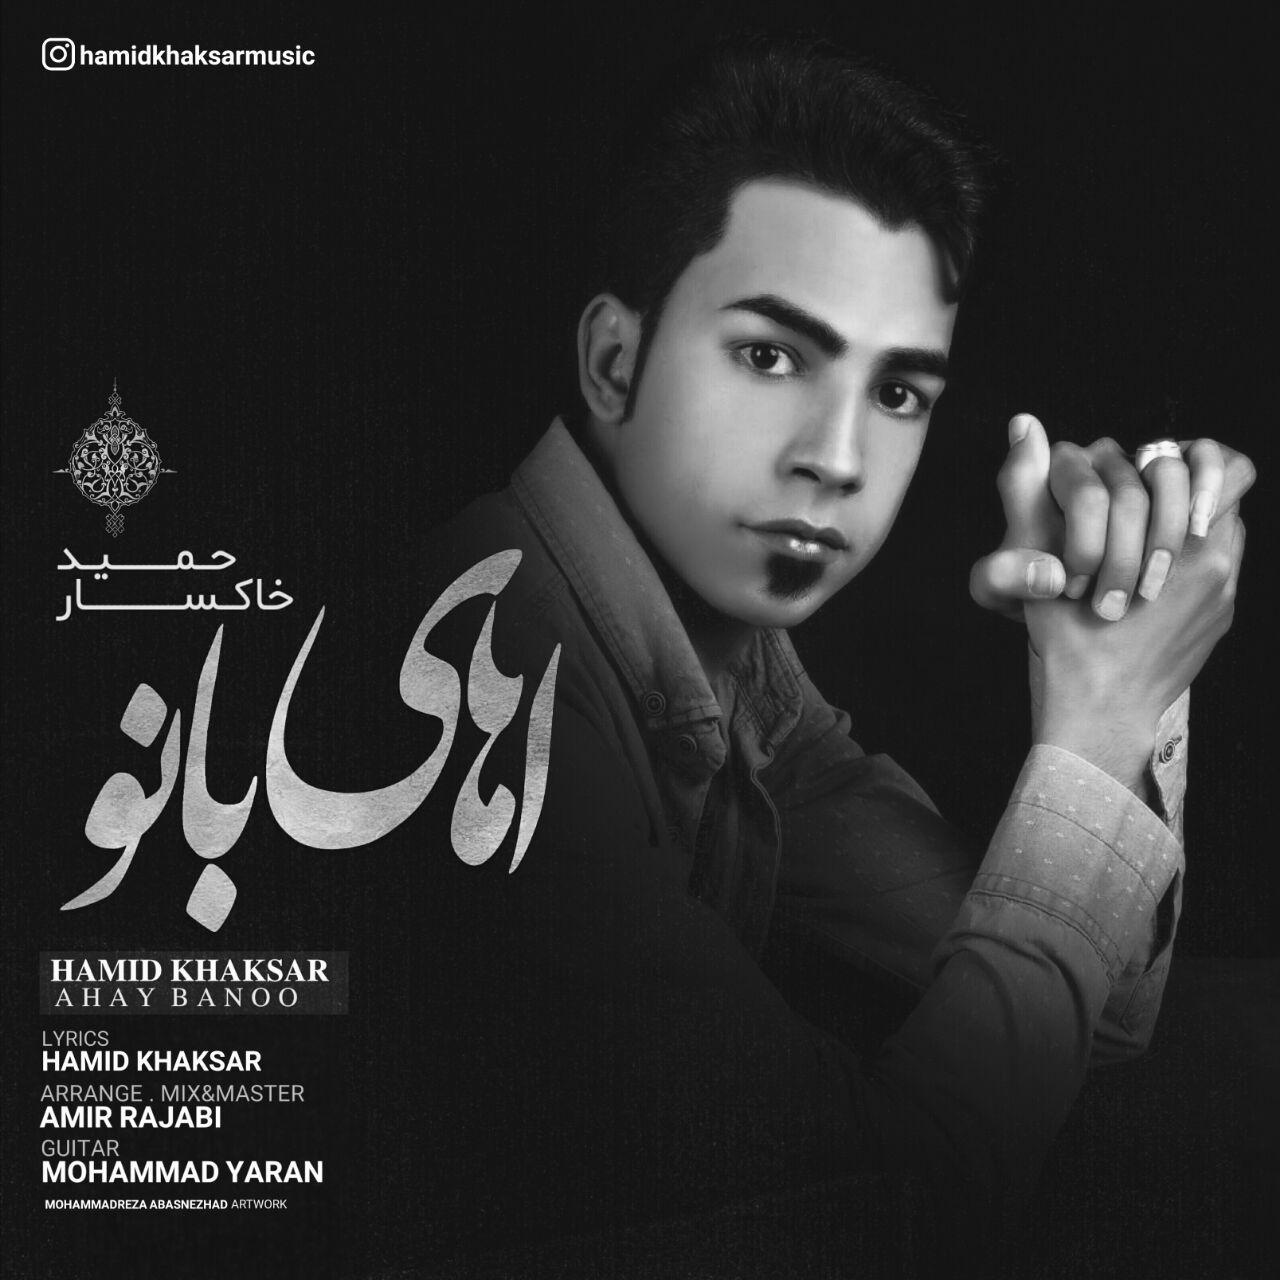 Hamid Khaksar – Ahay Bano